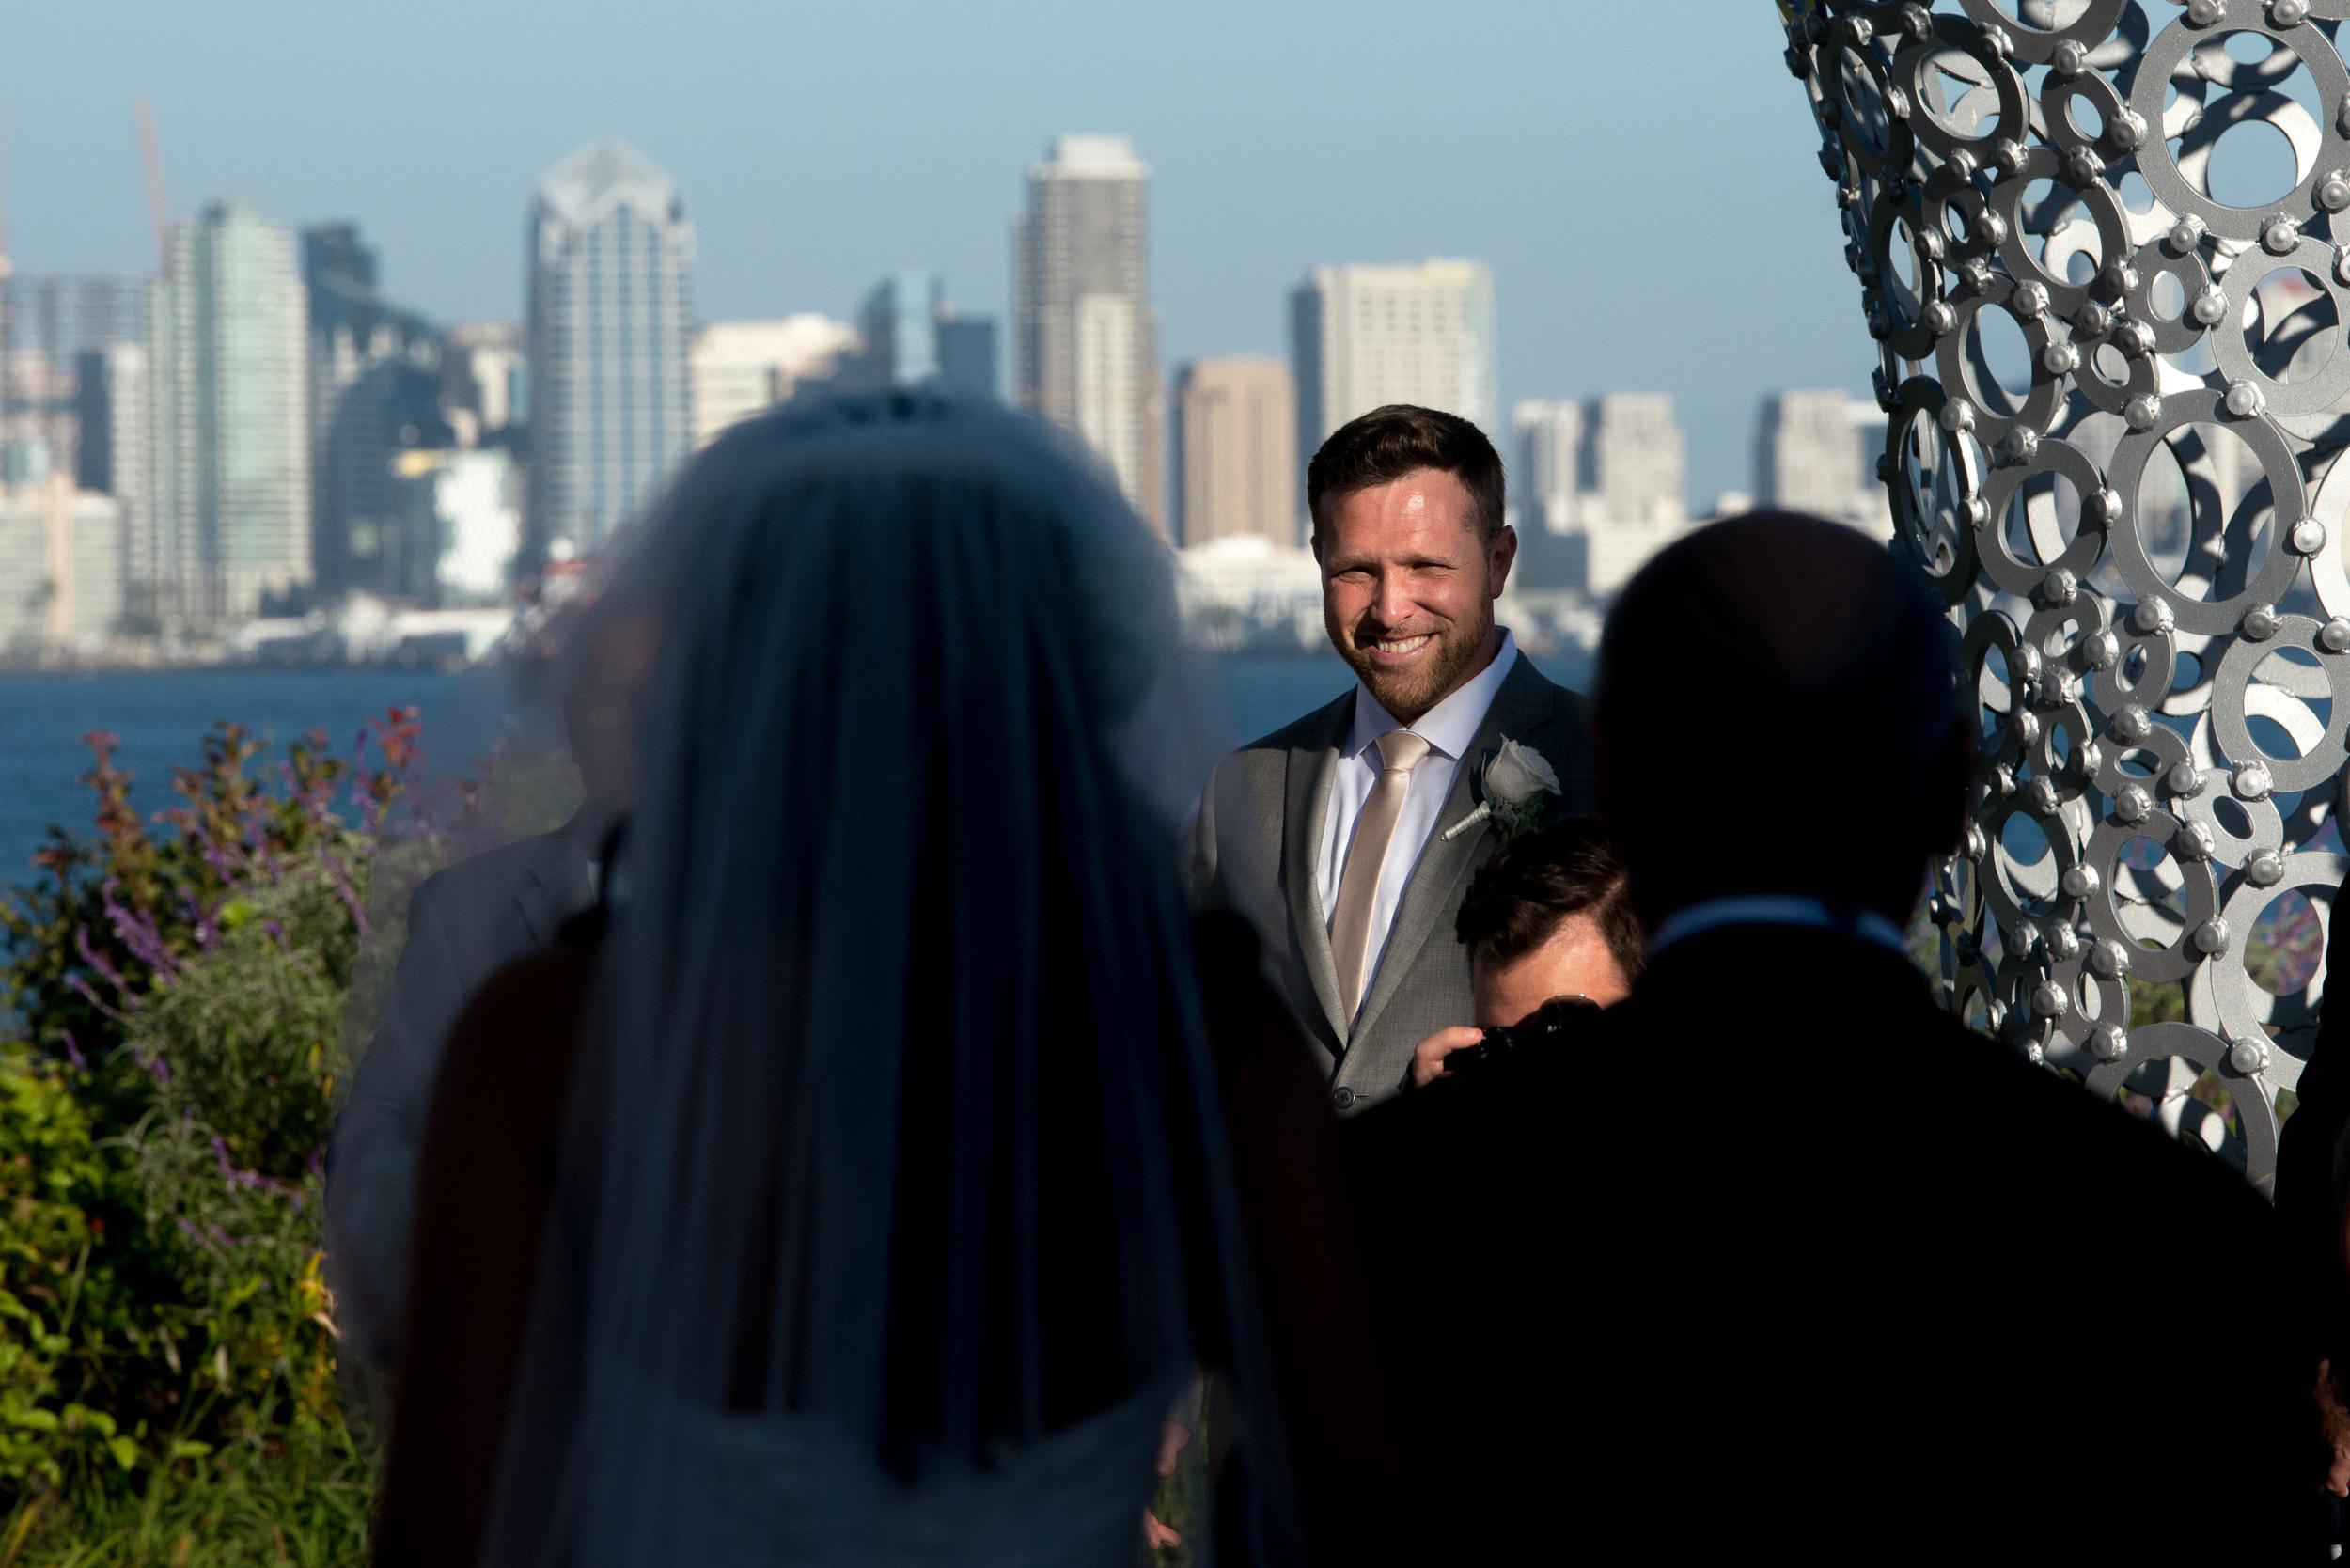 tom-hams-lighthouse-wedding-_D802968.jpg